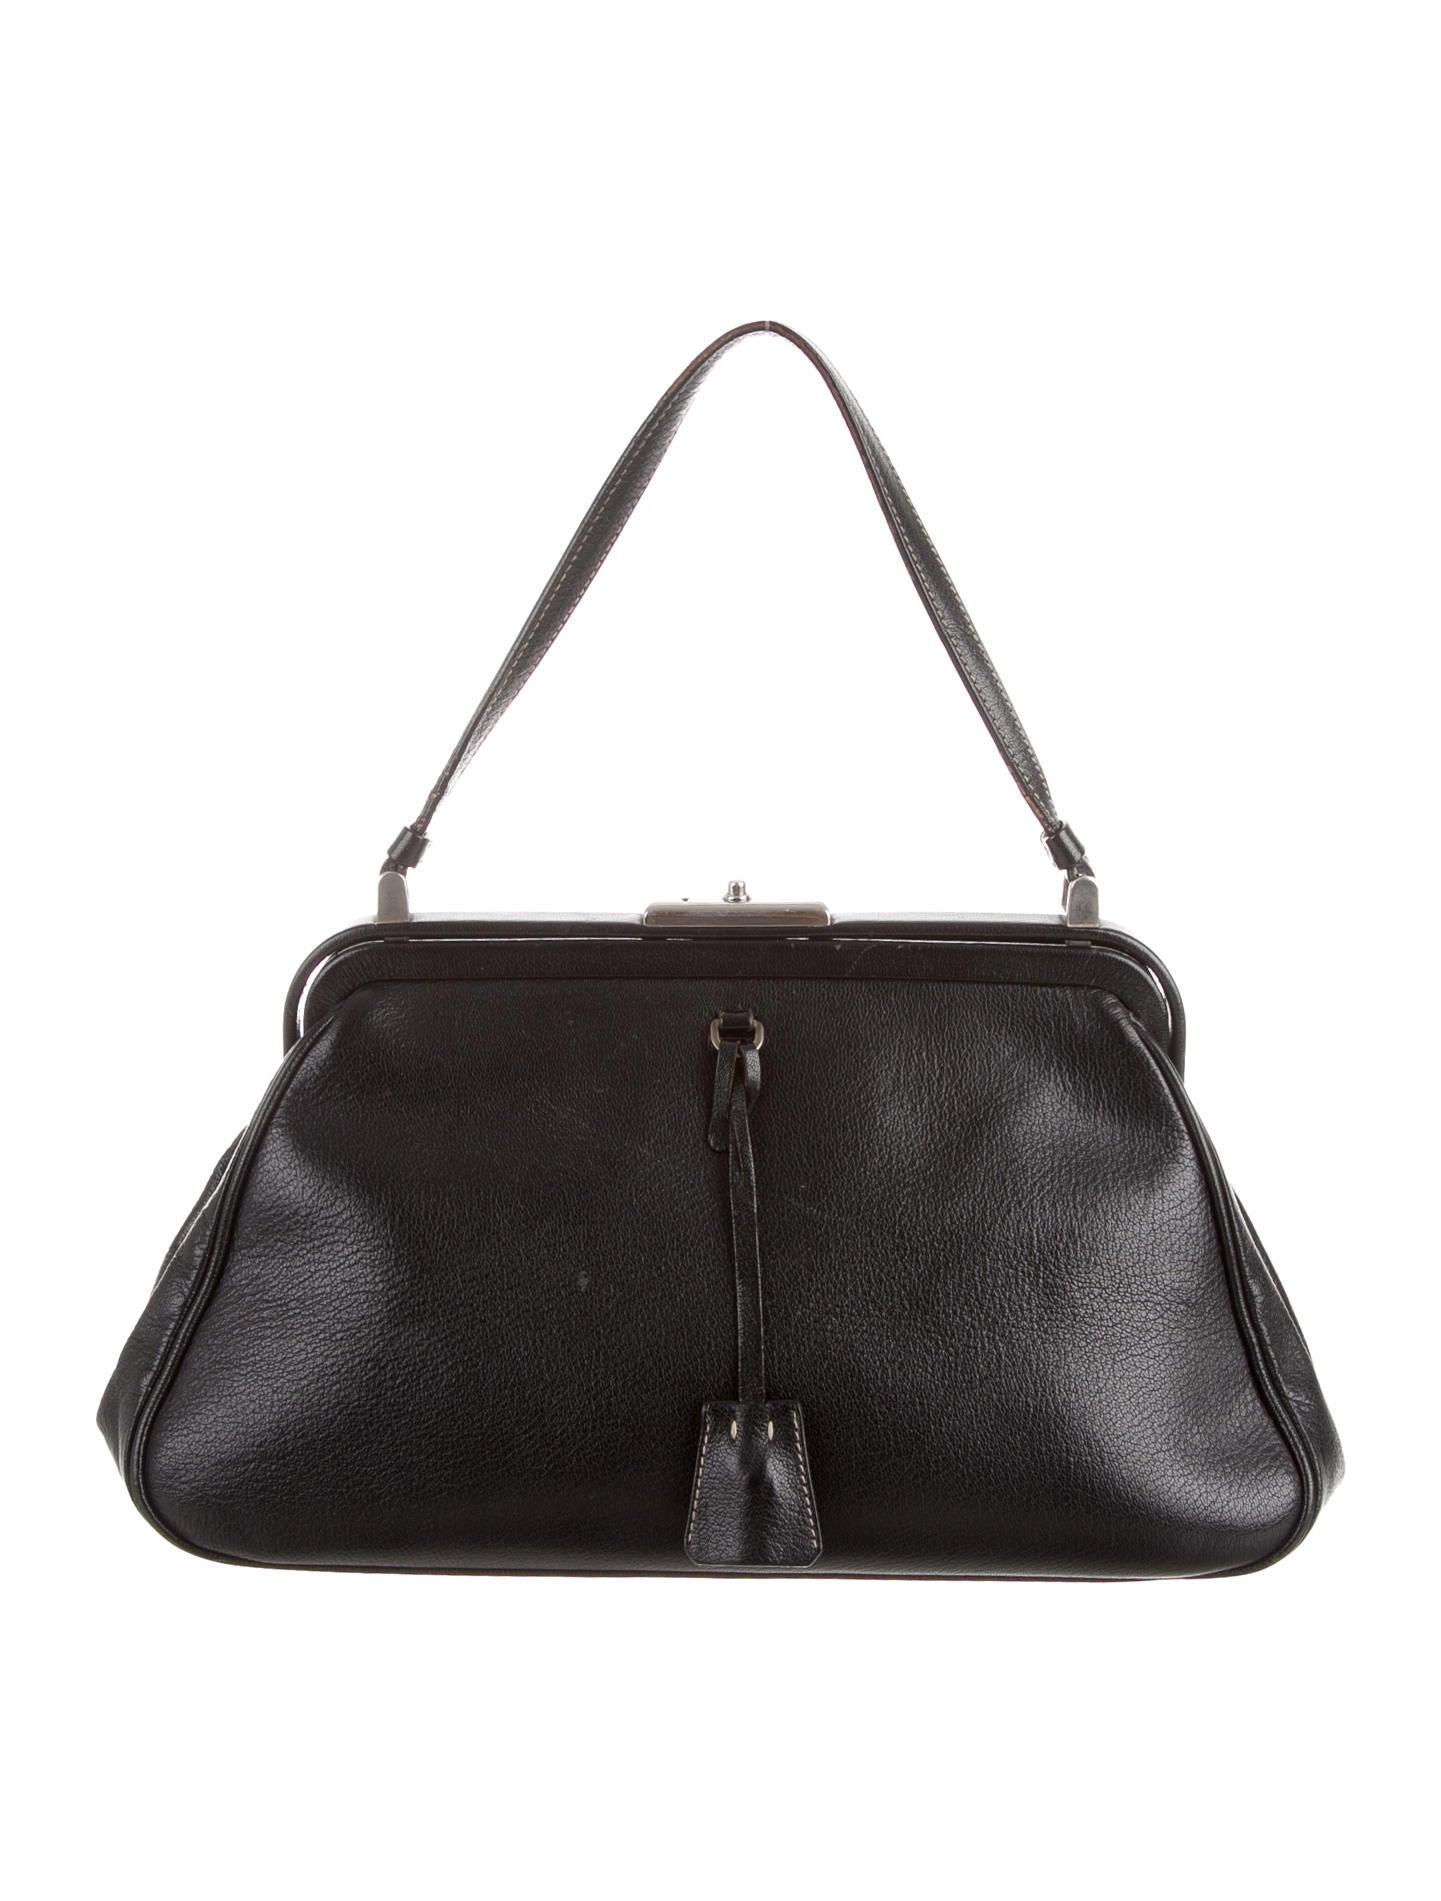 cuir handbags - prada madras handle bag, identical replica handbags